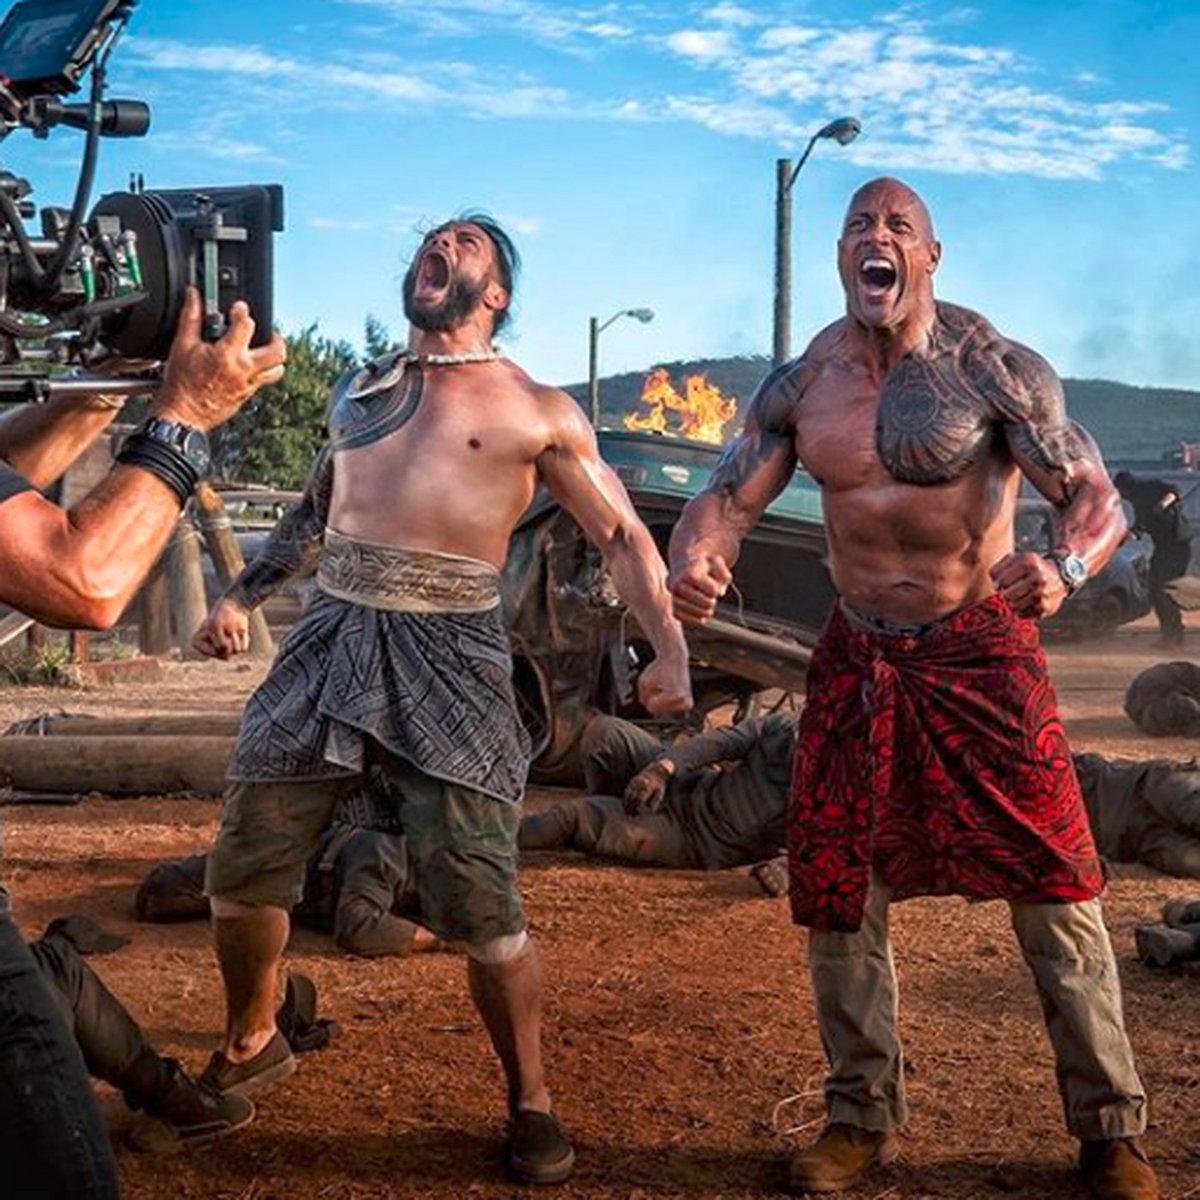 123movies Watch Hobbs And Shaw 2019 Online For Full Movie Hd Free Streamingmoviehobbsandshaw2019online